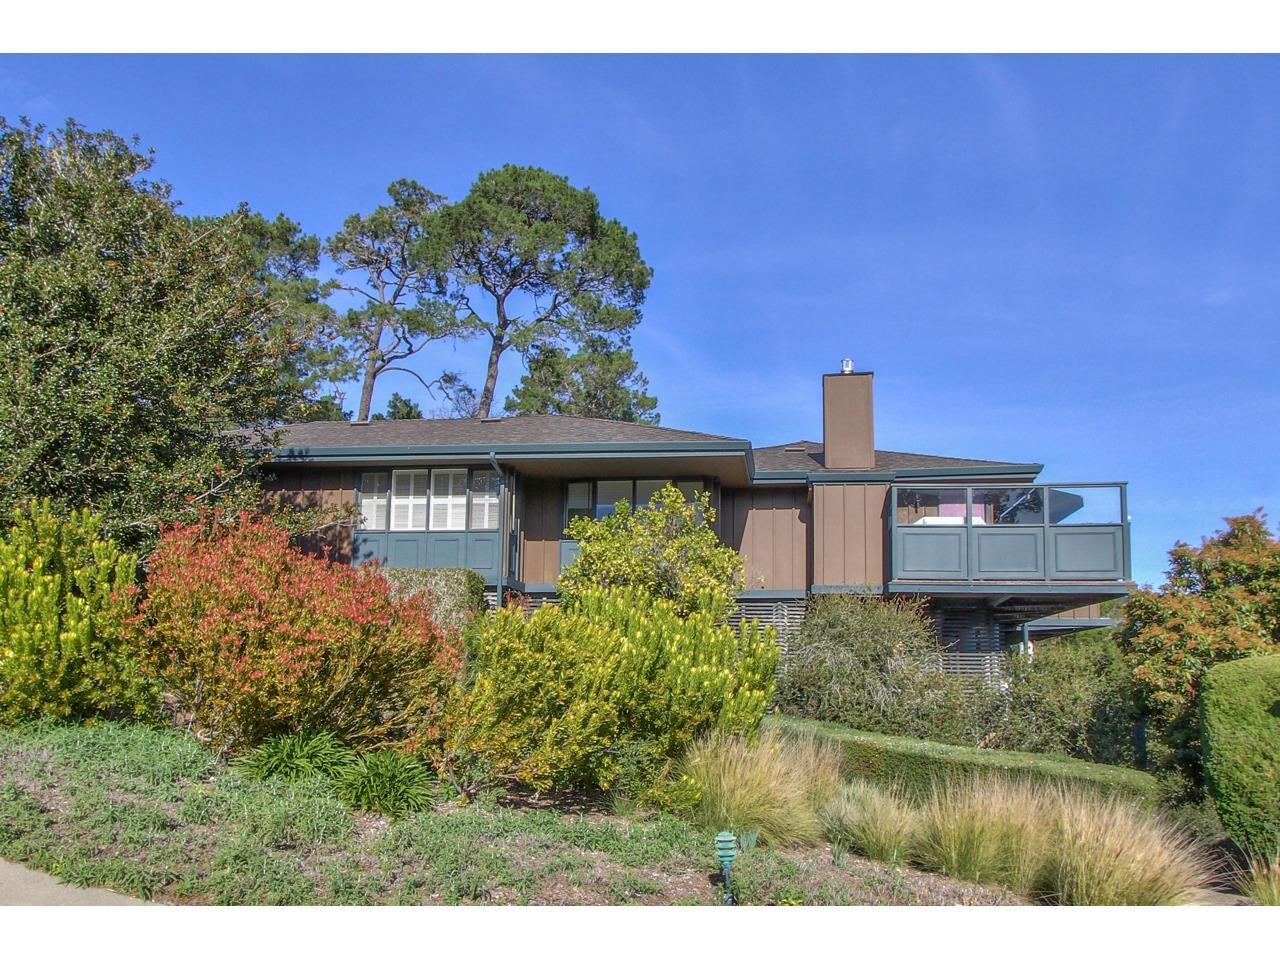 271 Del Mesa Carmel, Carmel in Monterey County, CA 93923 Home for Sale